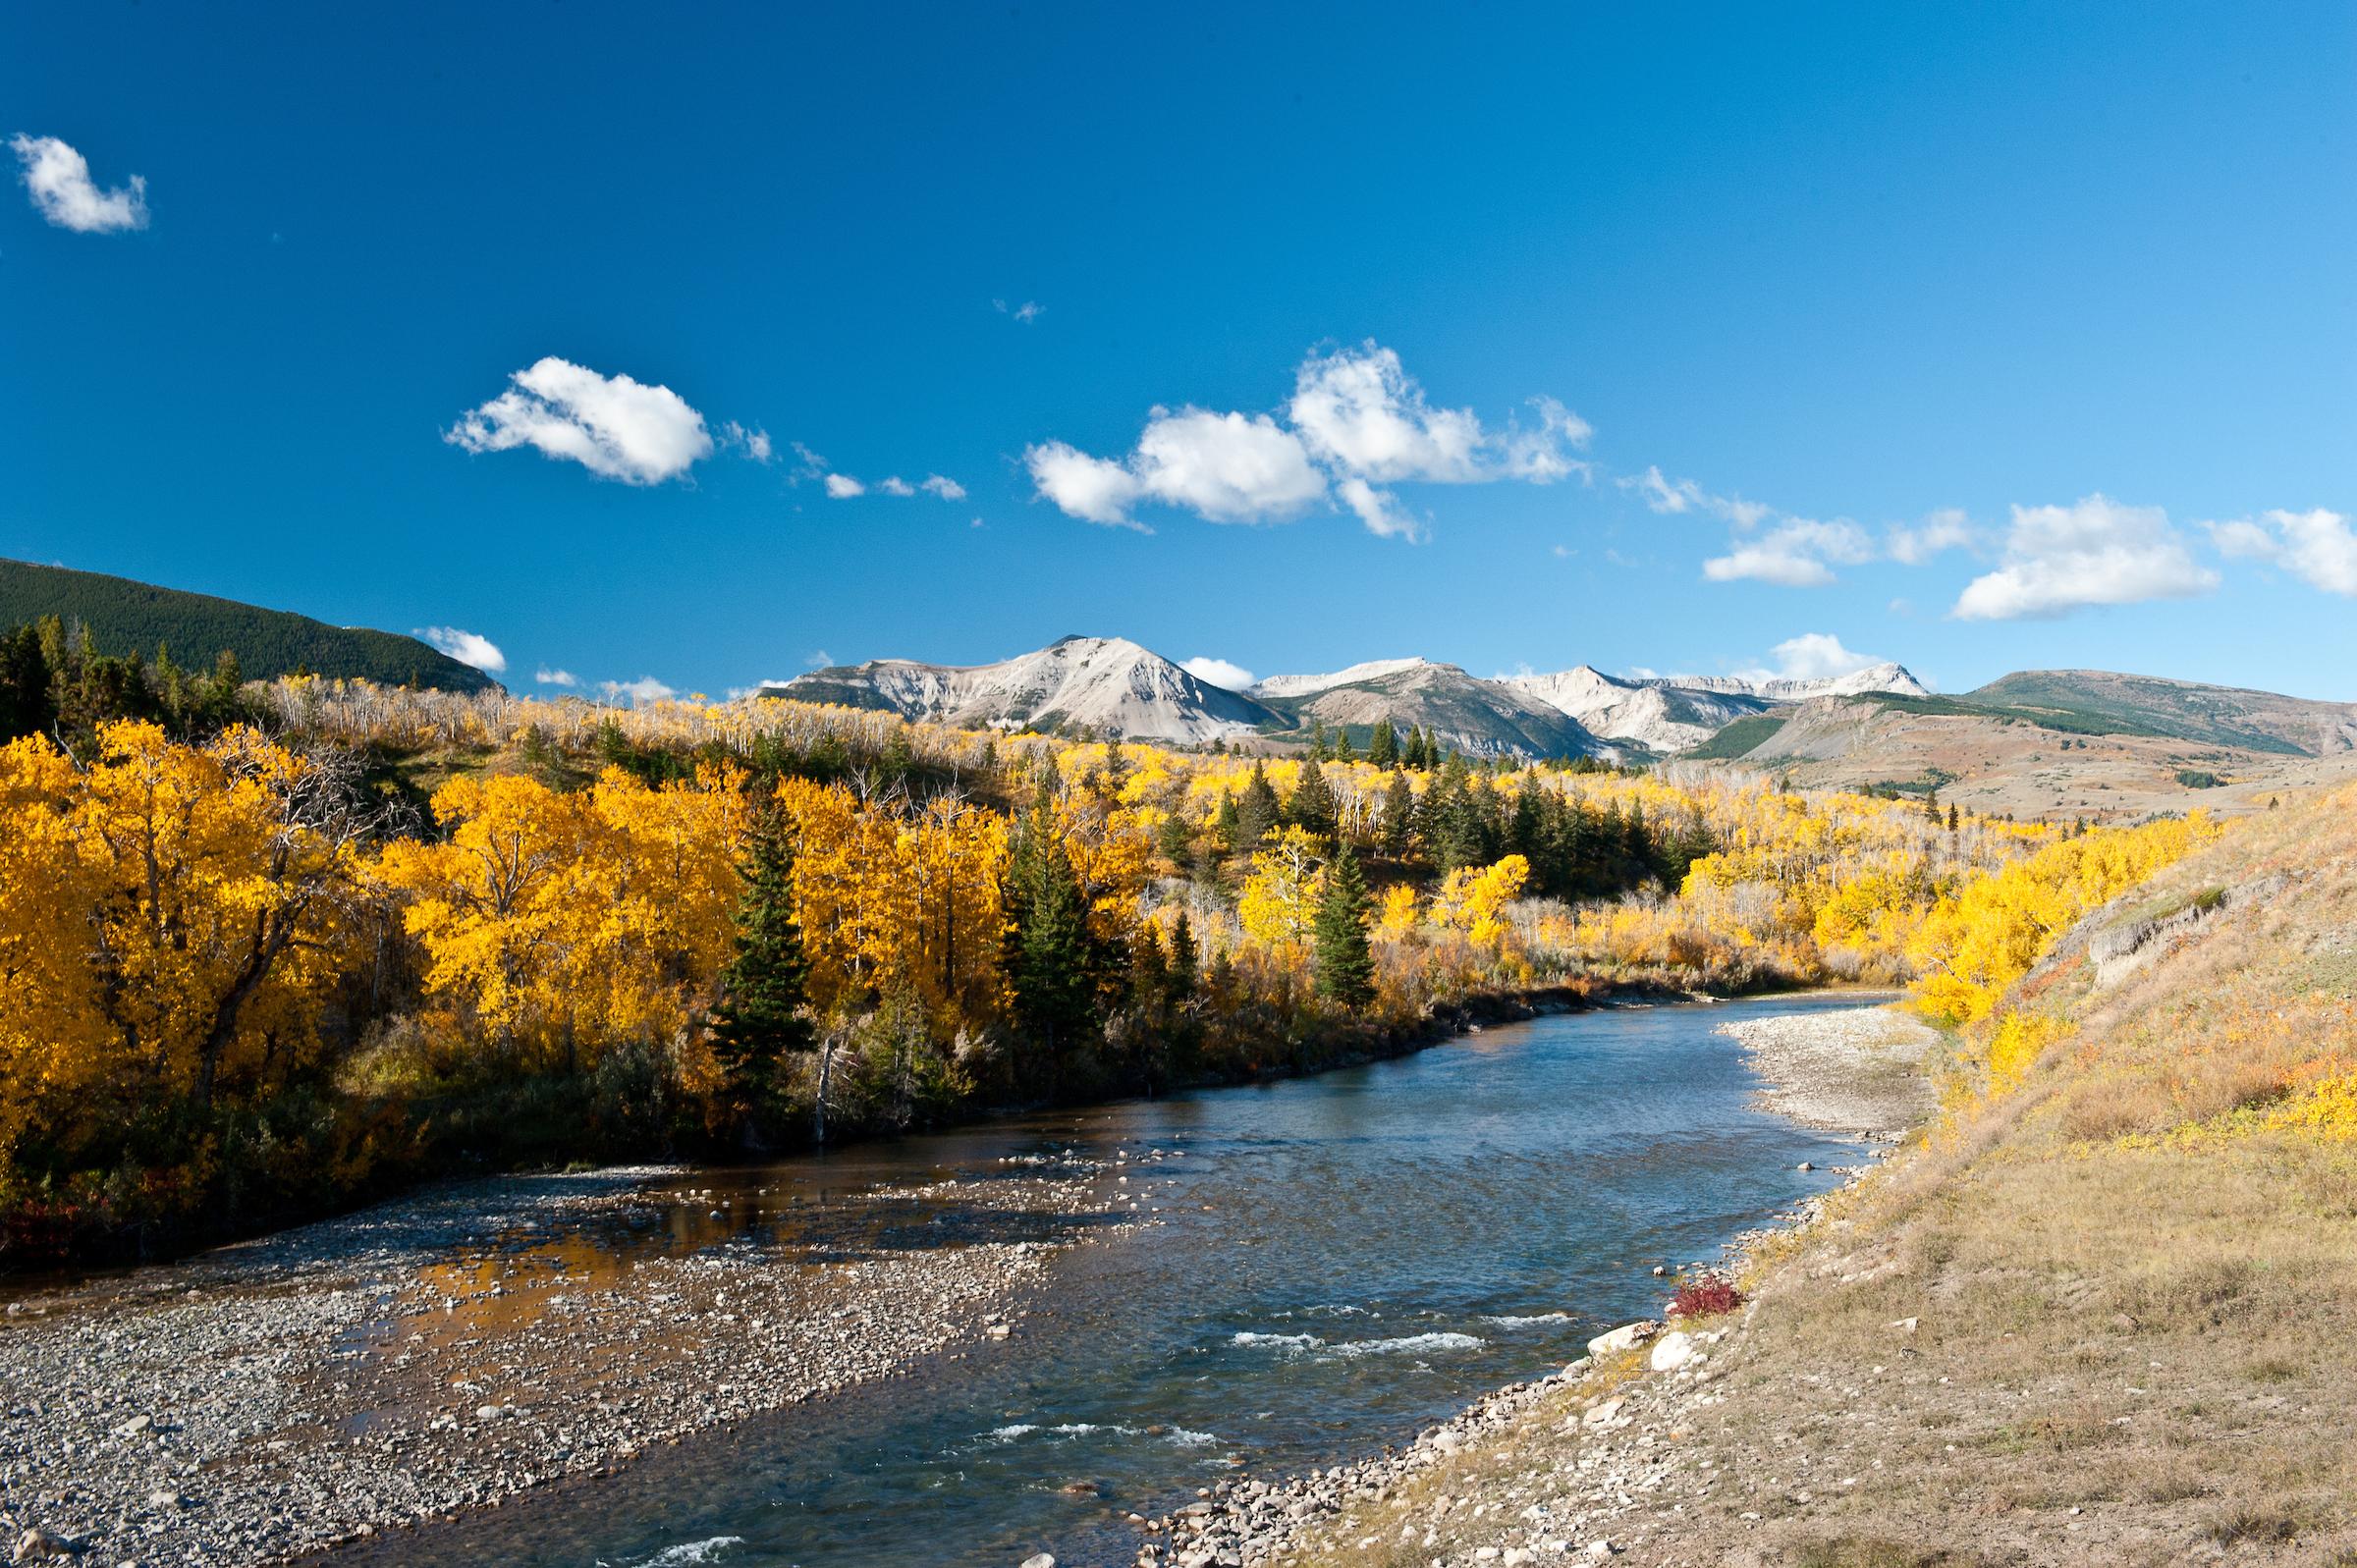 Birch Creek along the Rocky Mountain Front, Badger Two Medicine area, Blackfeet Indian Reservation, Montana